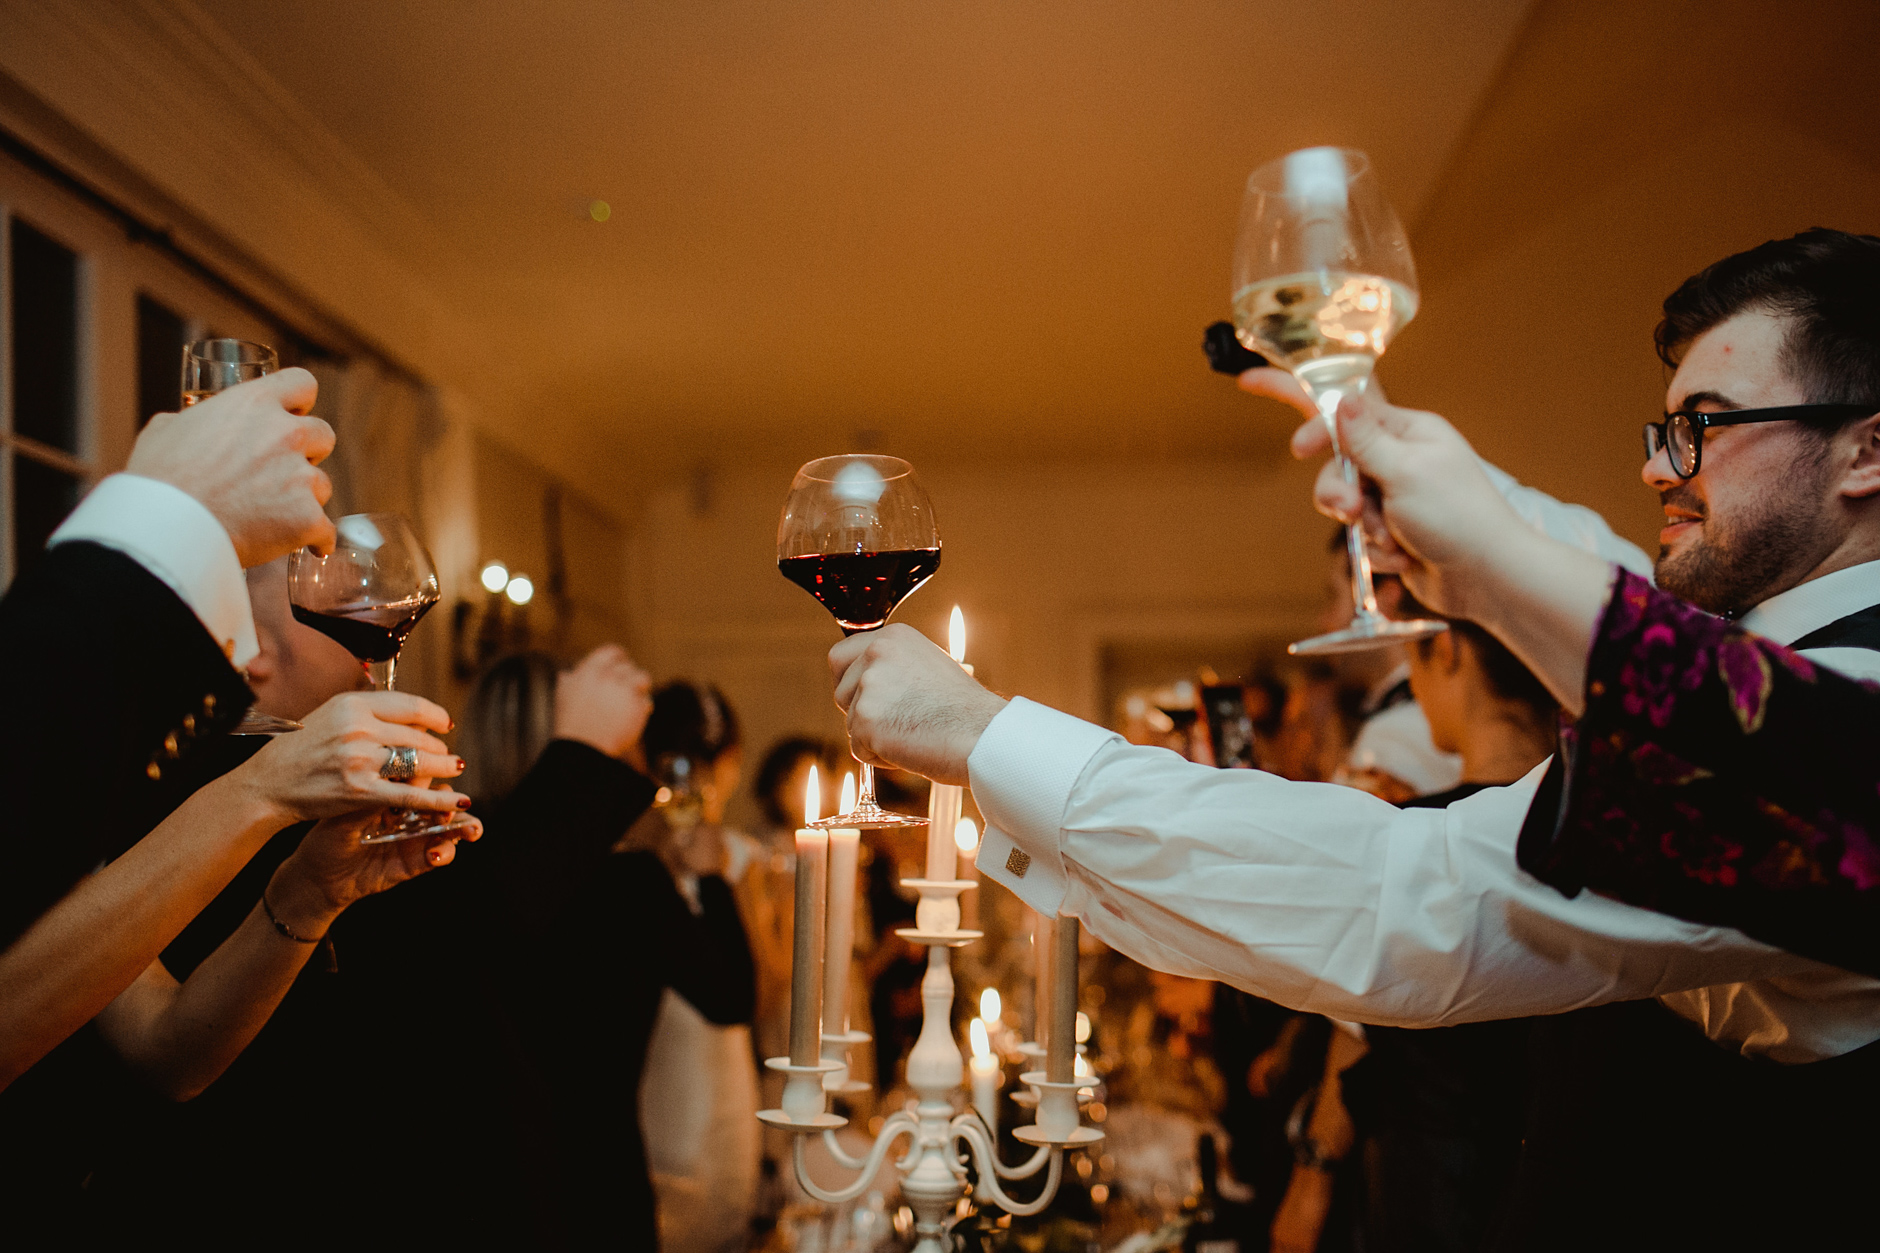 Glentruim-Wedding-Nikki-Leadbetter-Photography-299.jpg